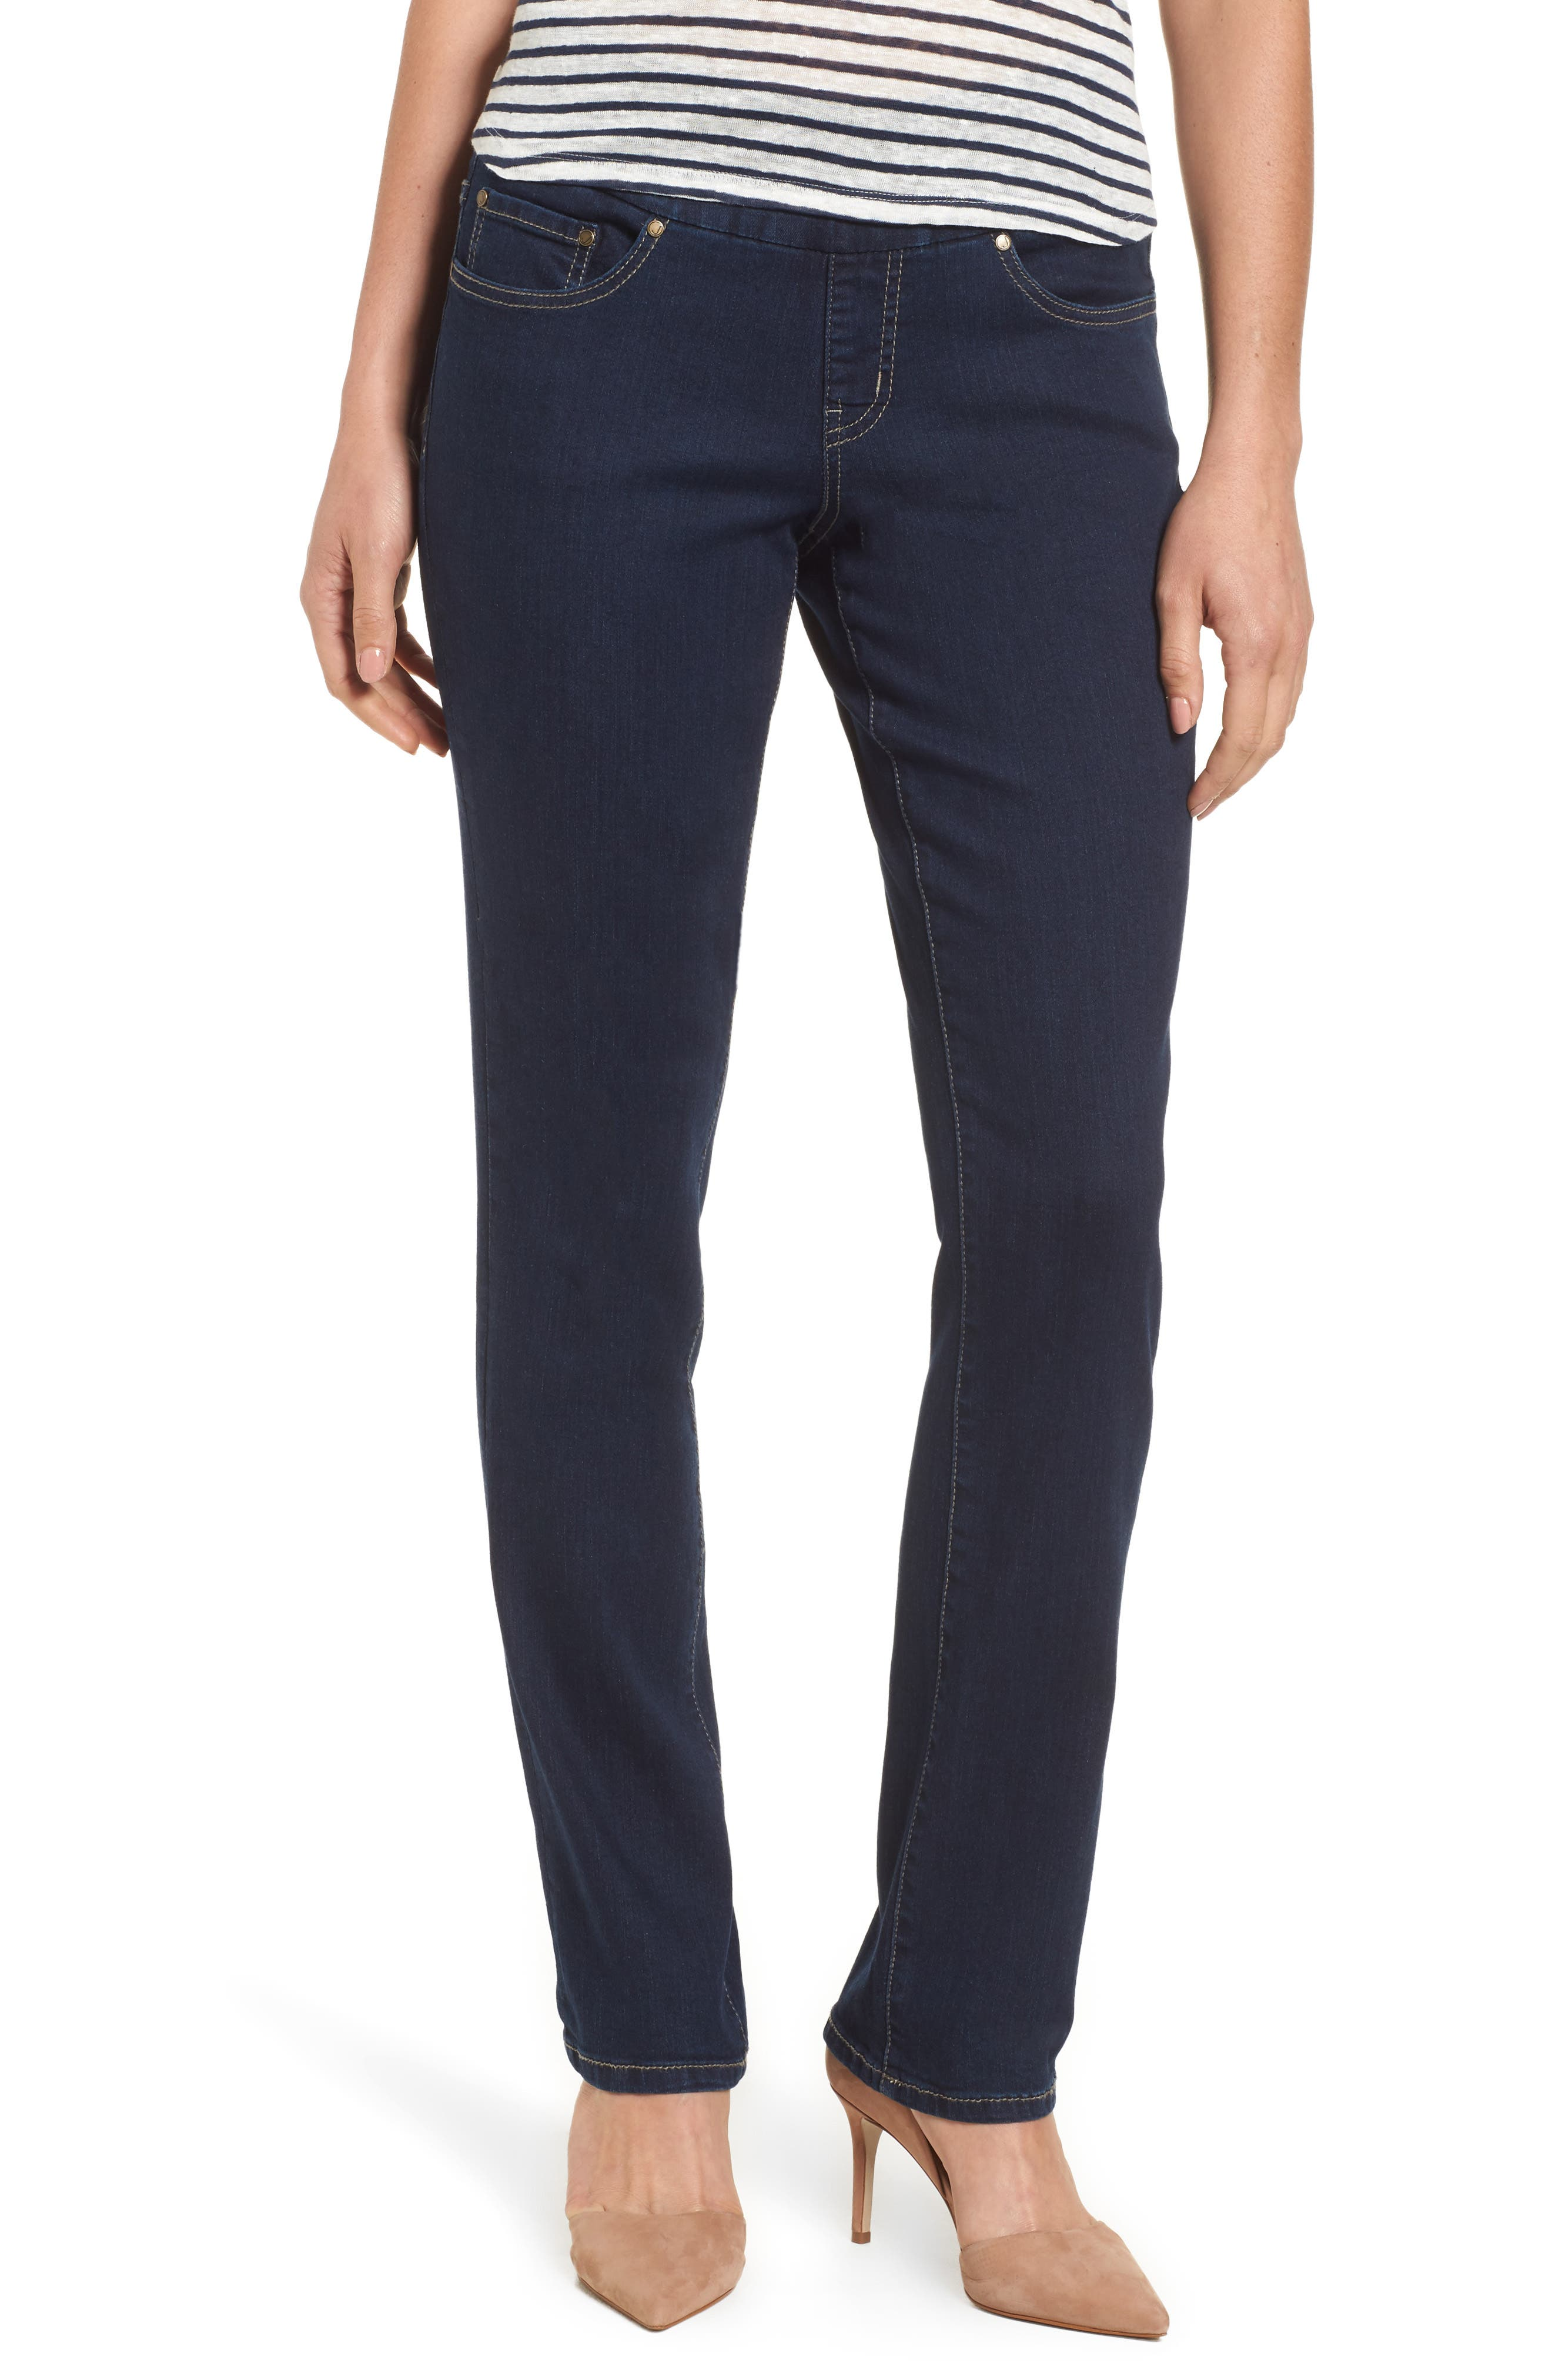 Peri Pull-On Straight Leg Jeans,                         Main,                         color, DARK INDIGO